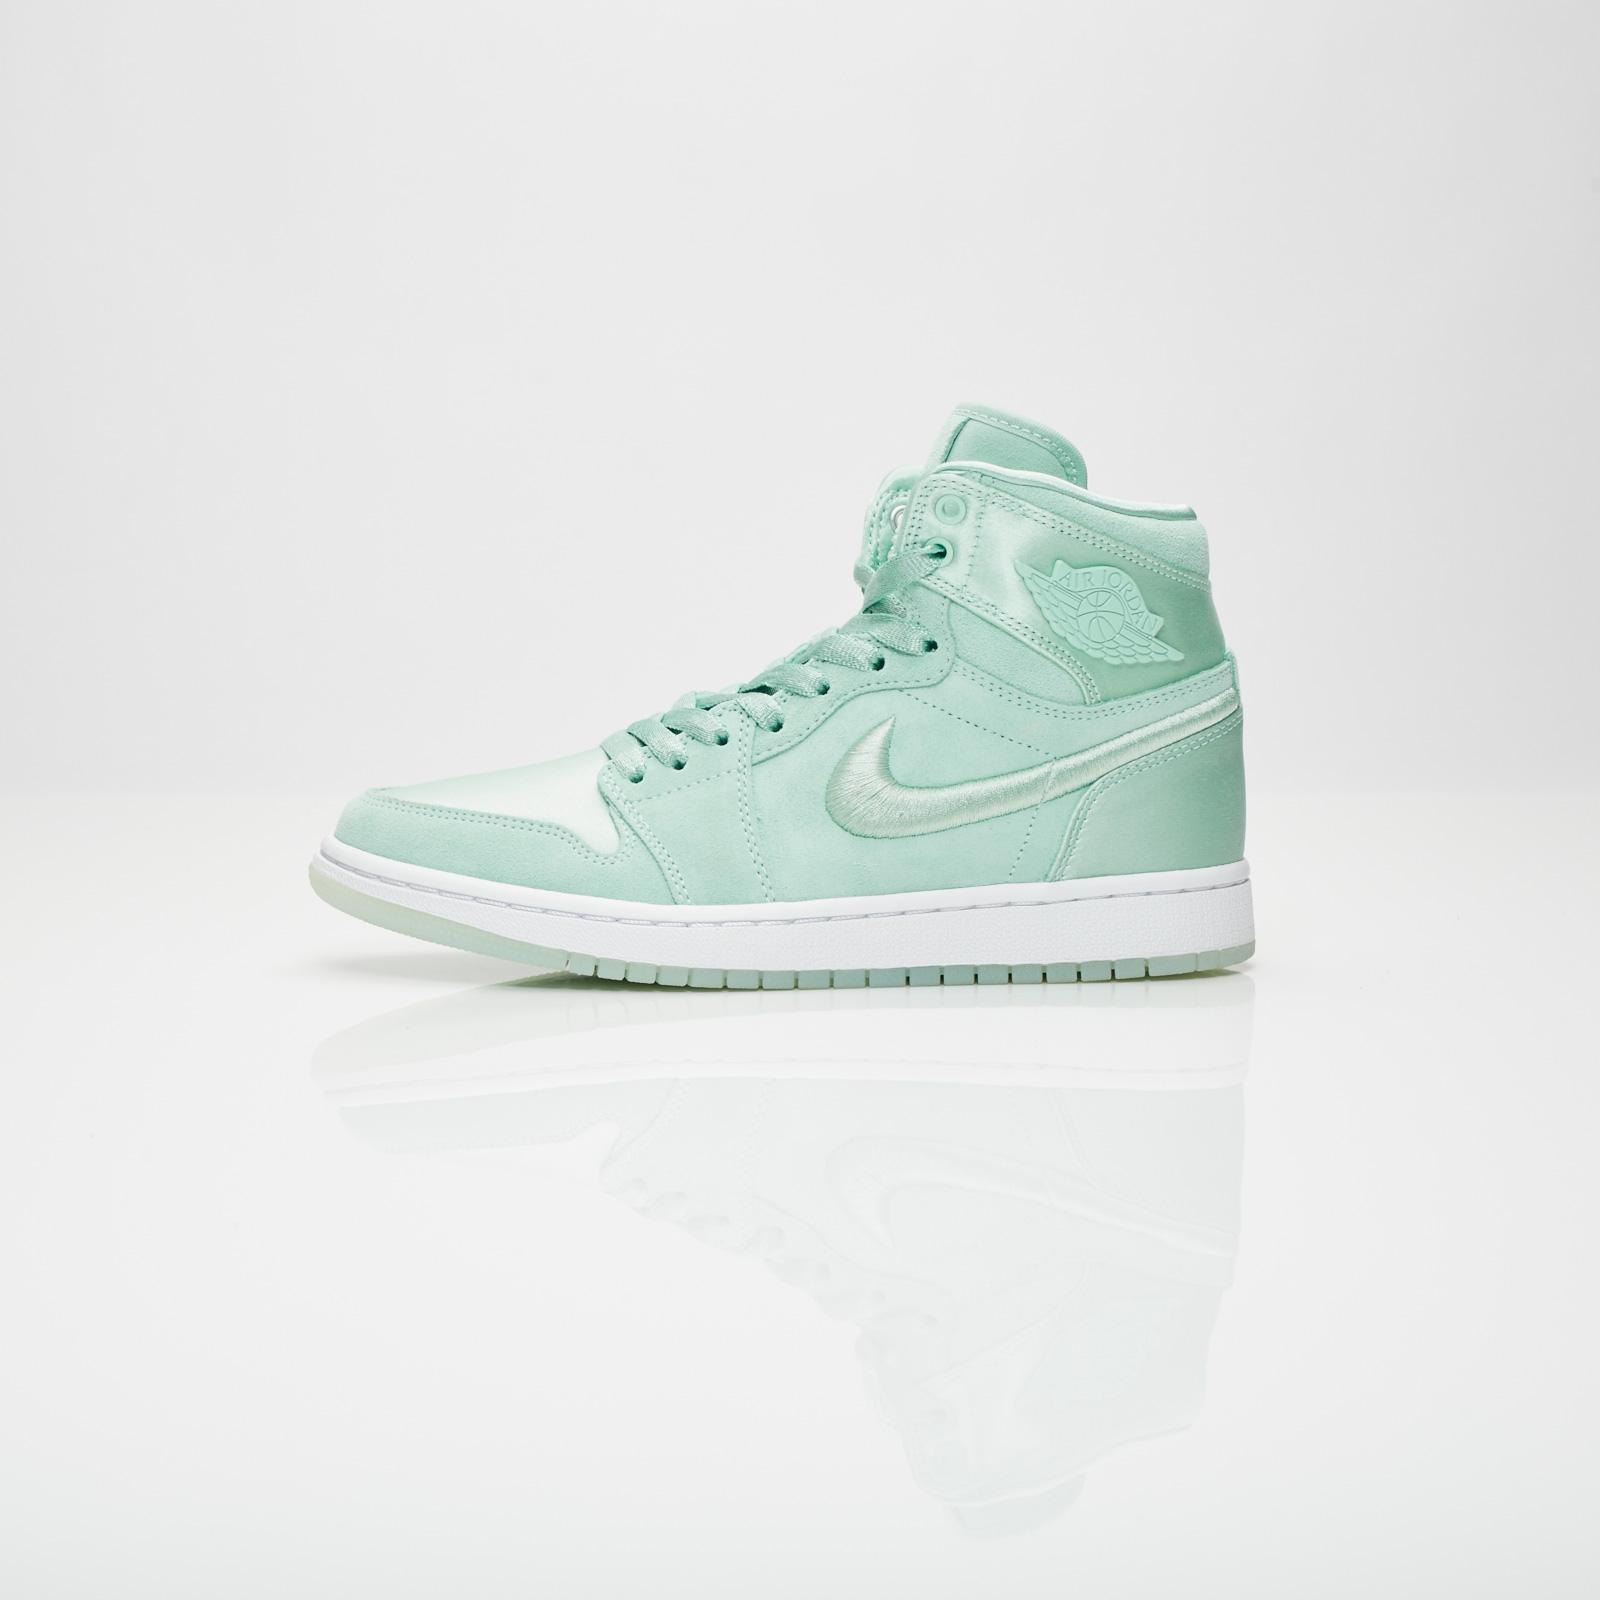 8b0b06700bb391 Jordan Brand Wmns Air Jordan 1 Retro High SOH - Ao1847-345 - Sneakersnstuff